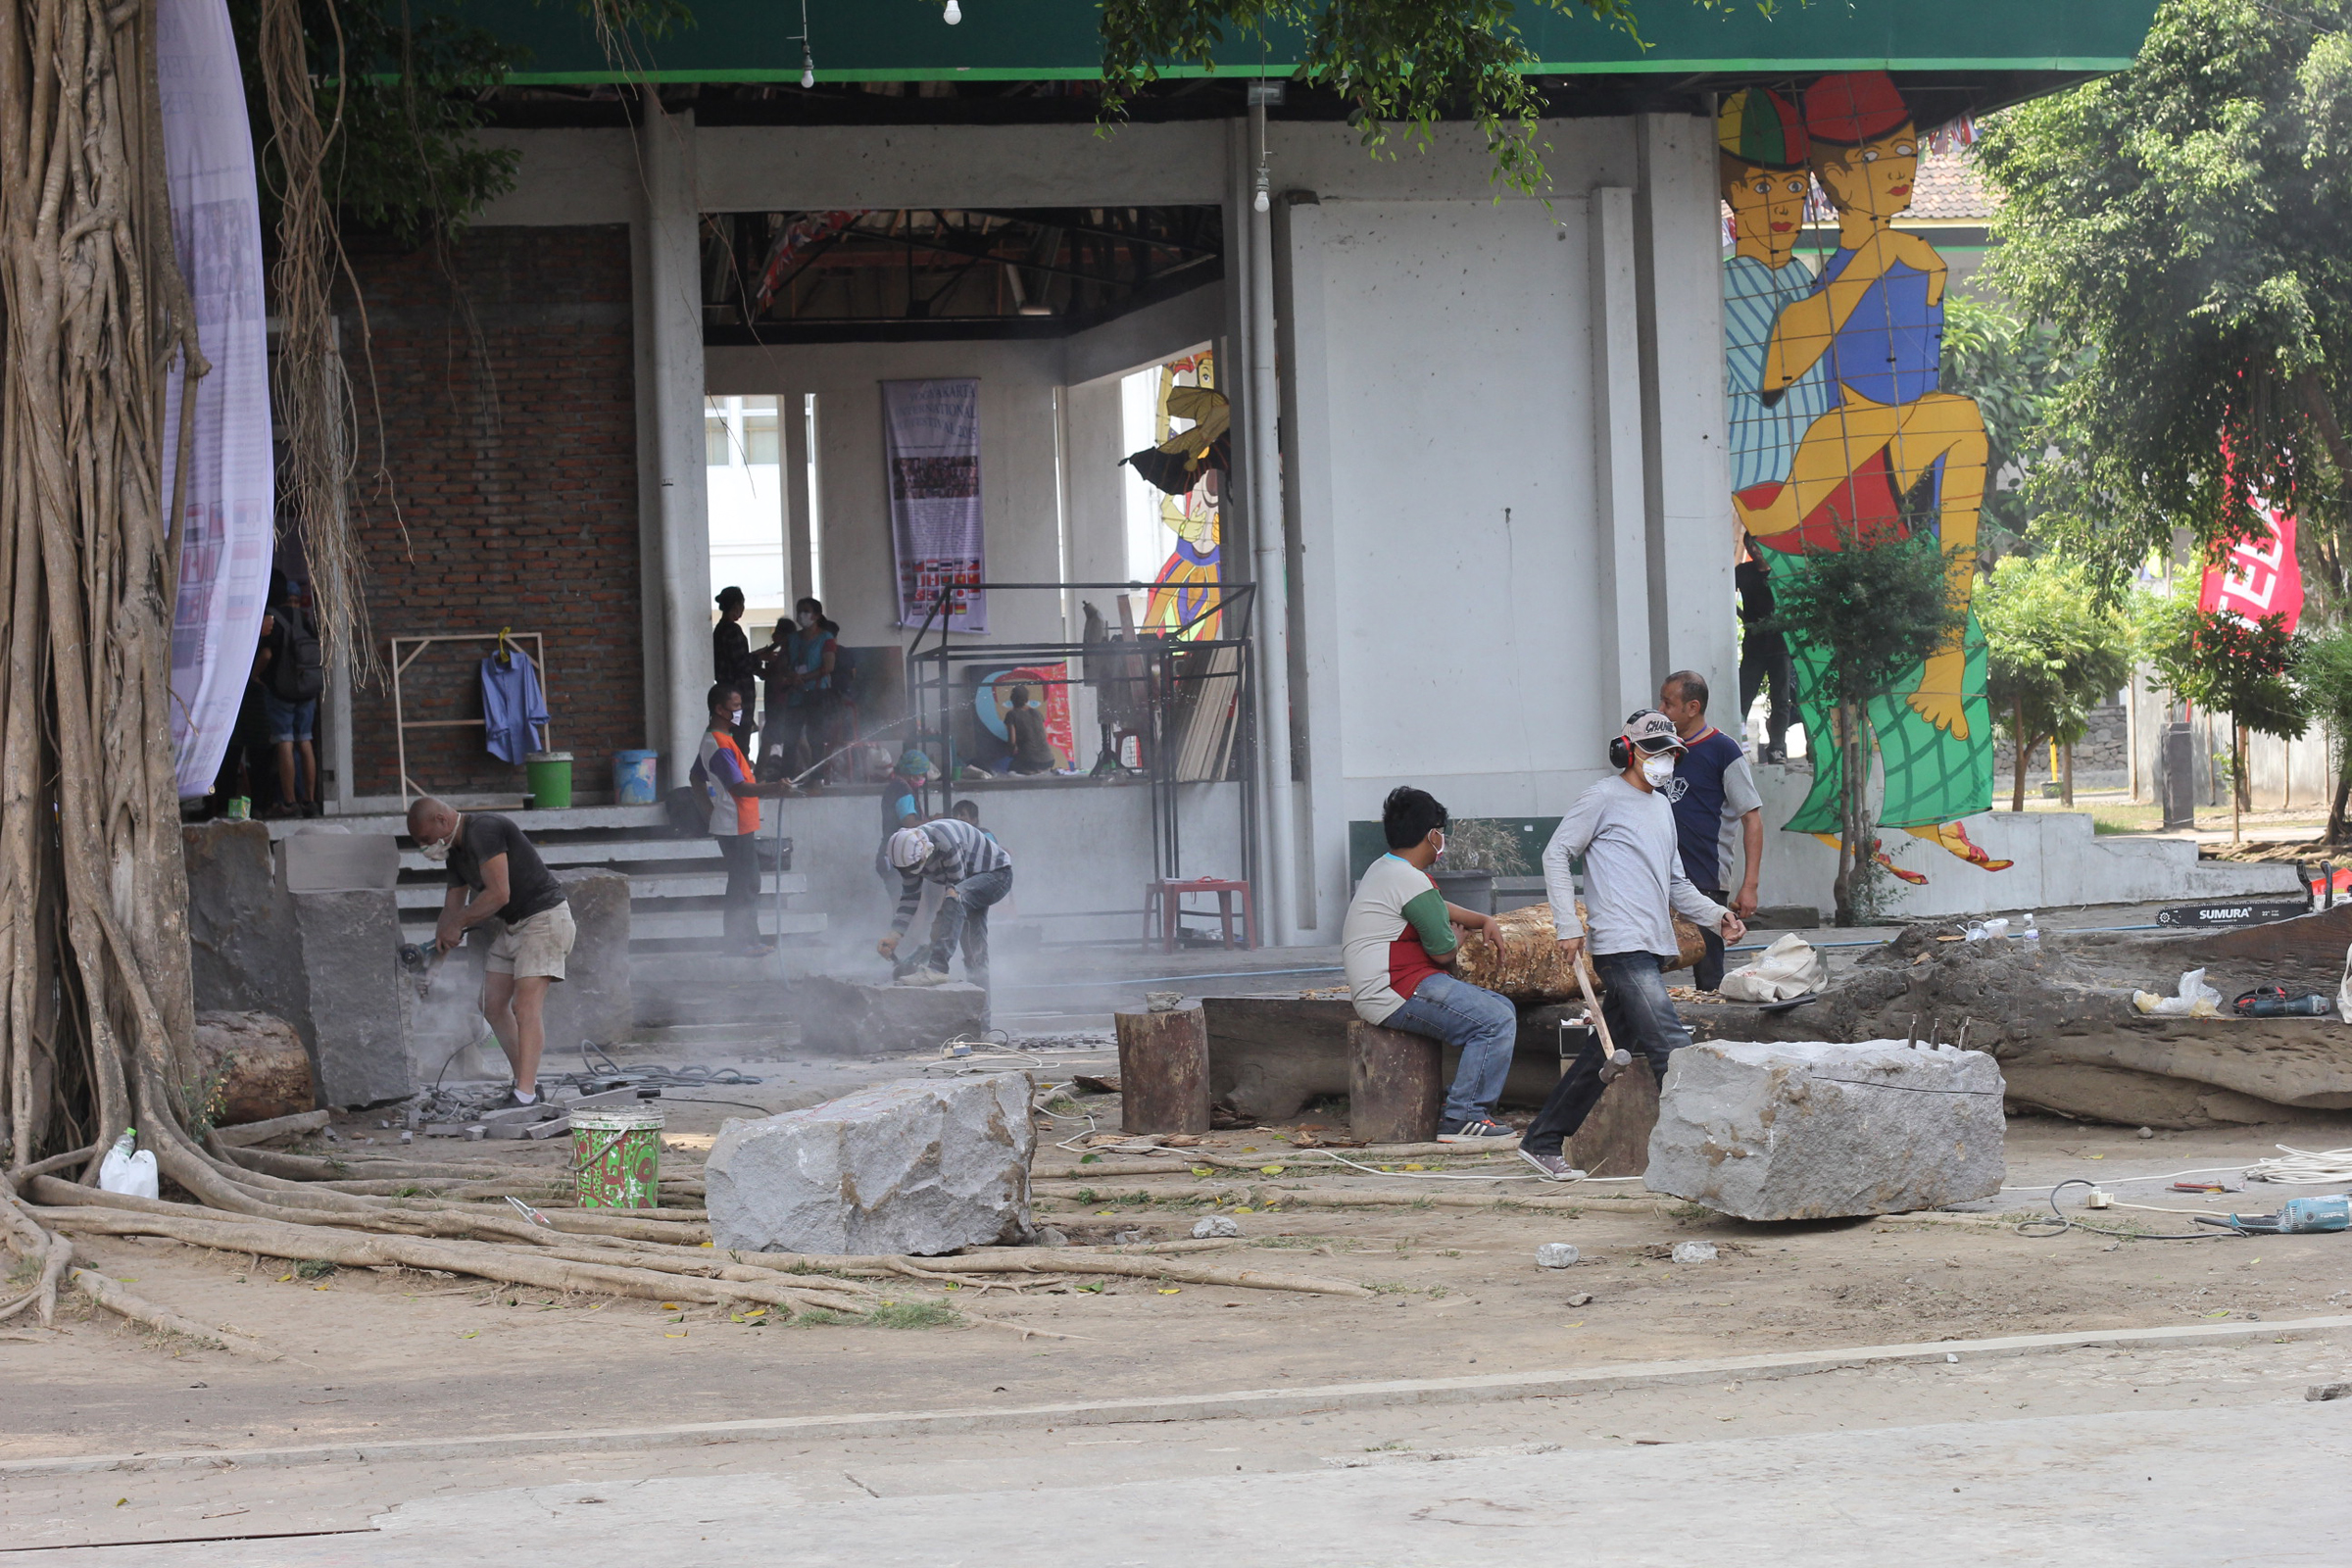 d_sculptors working in courtyard.jpg